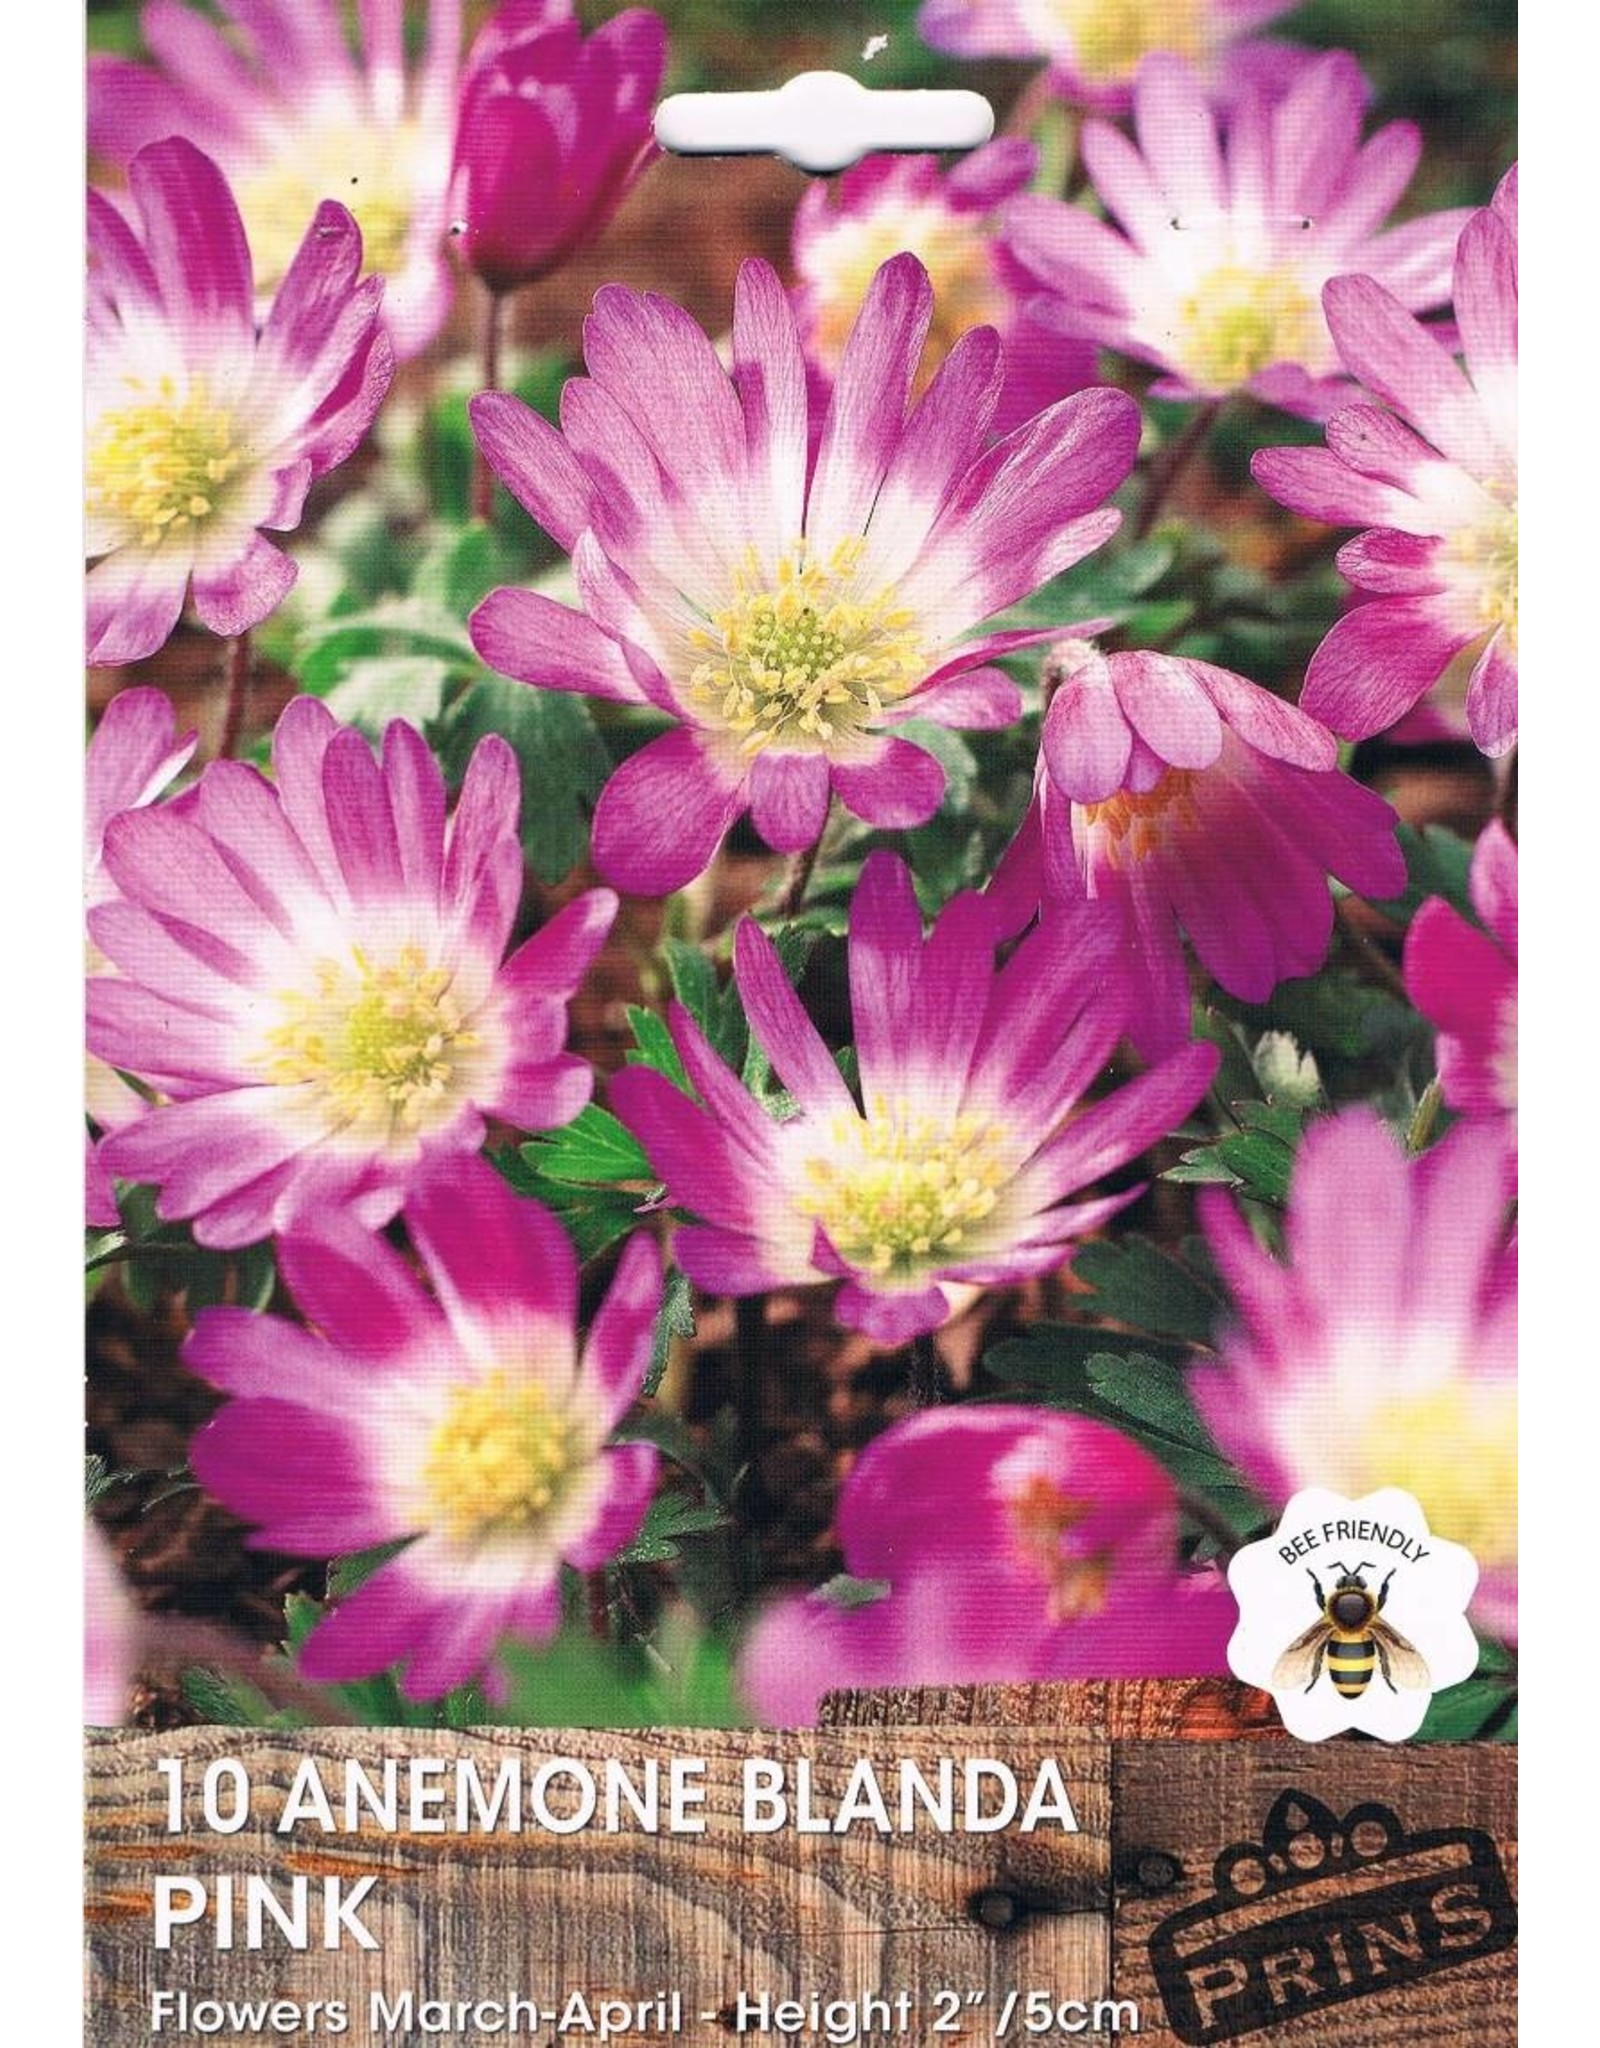 Hollands geteeld Anemone blanda Roze